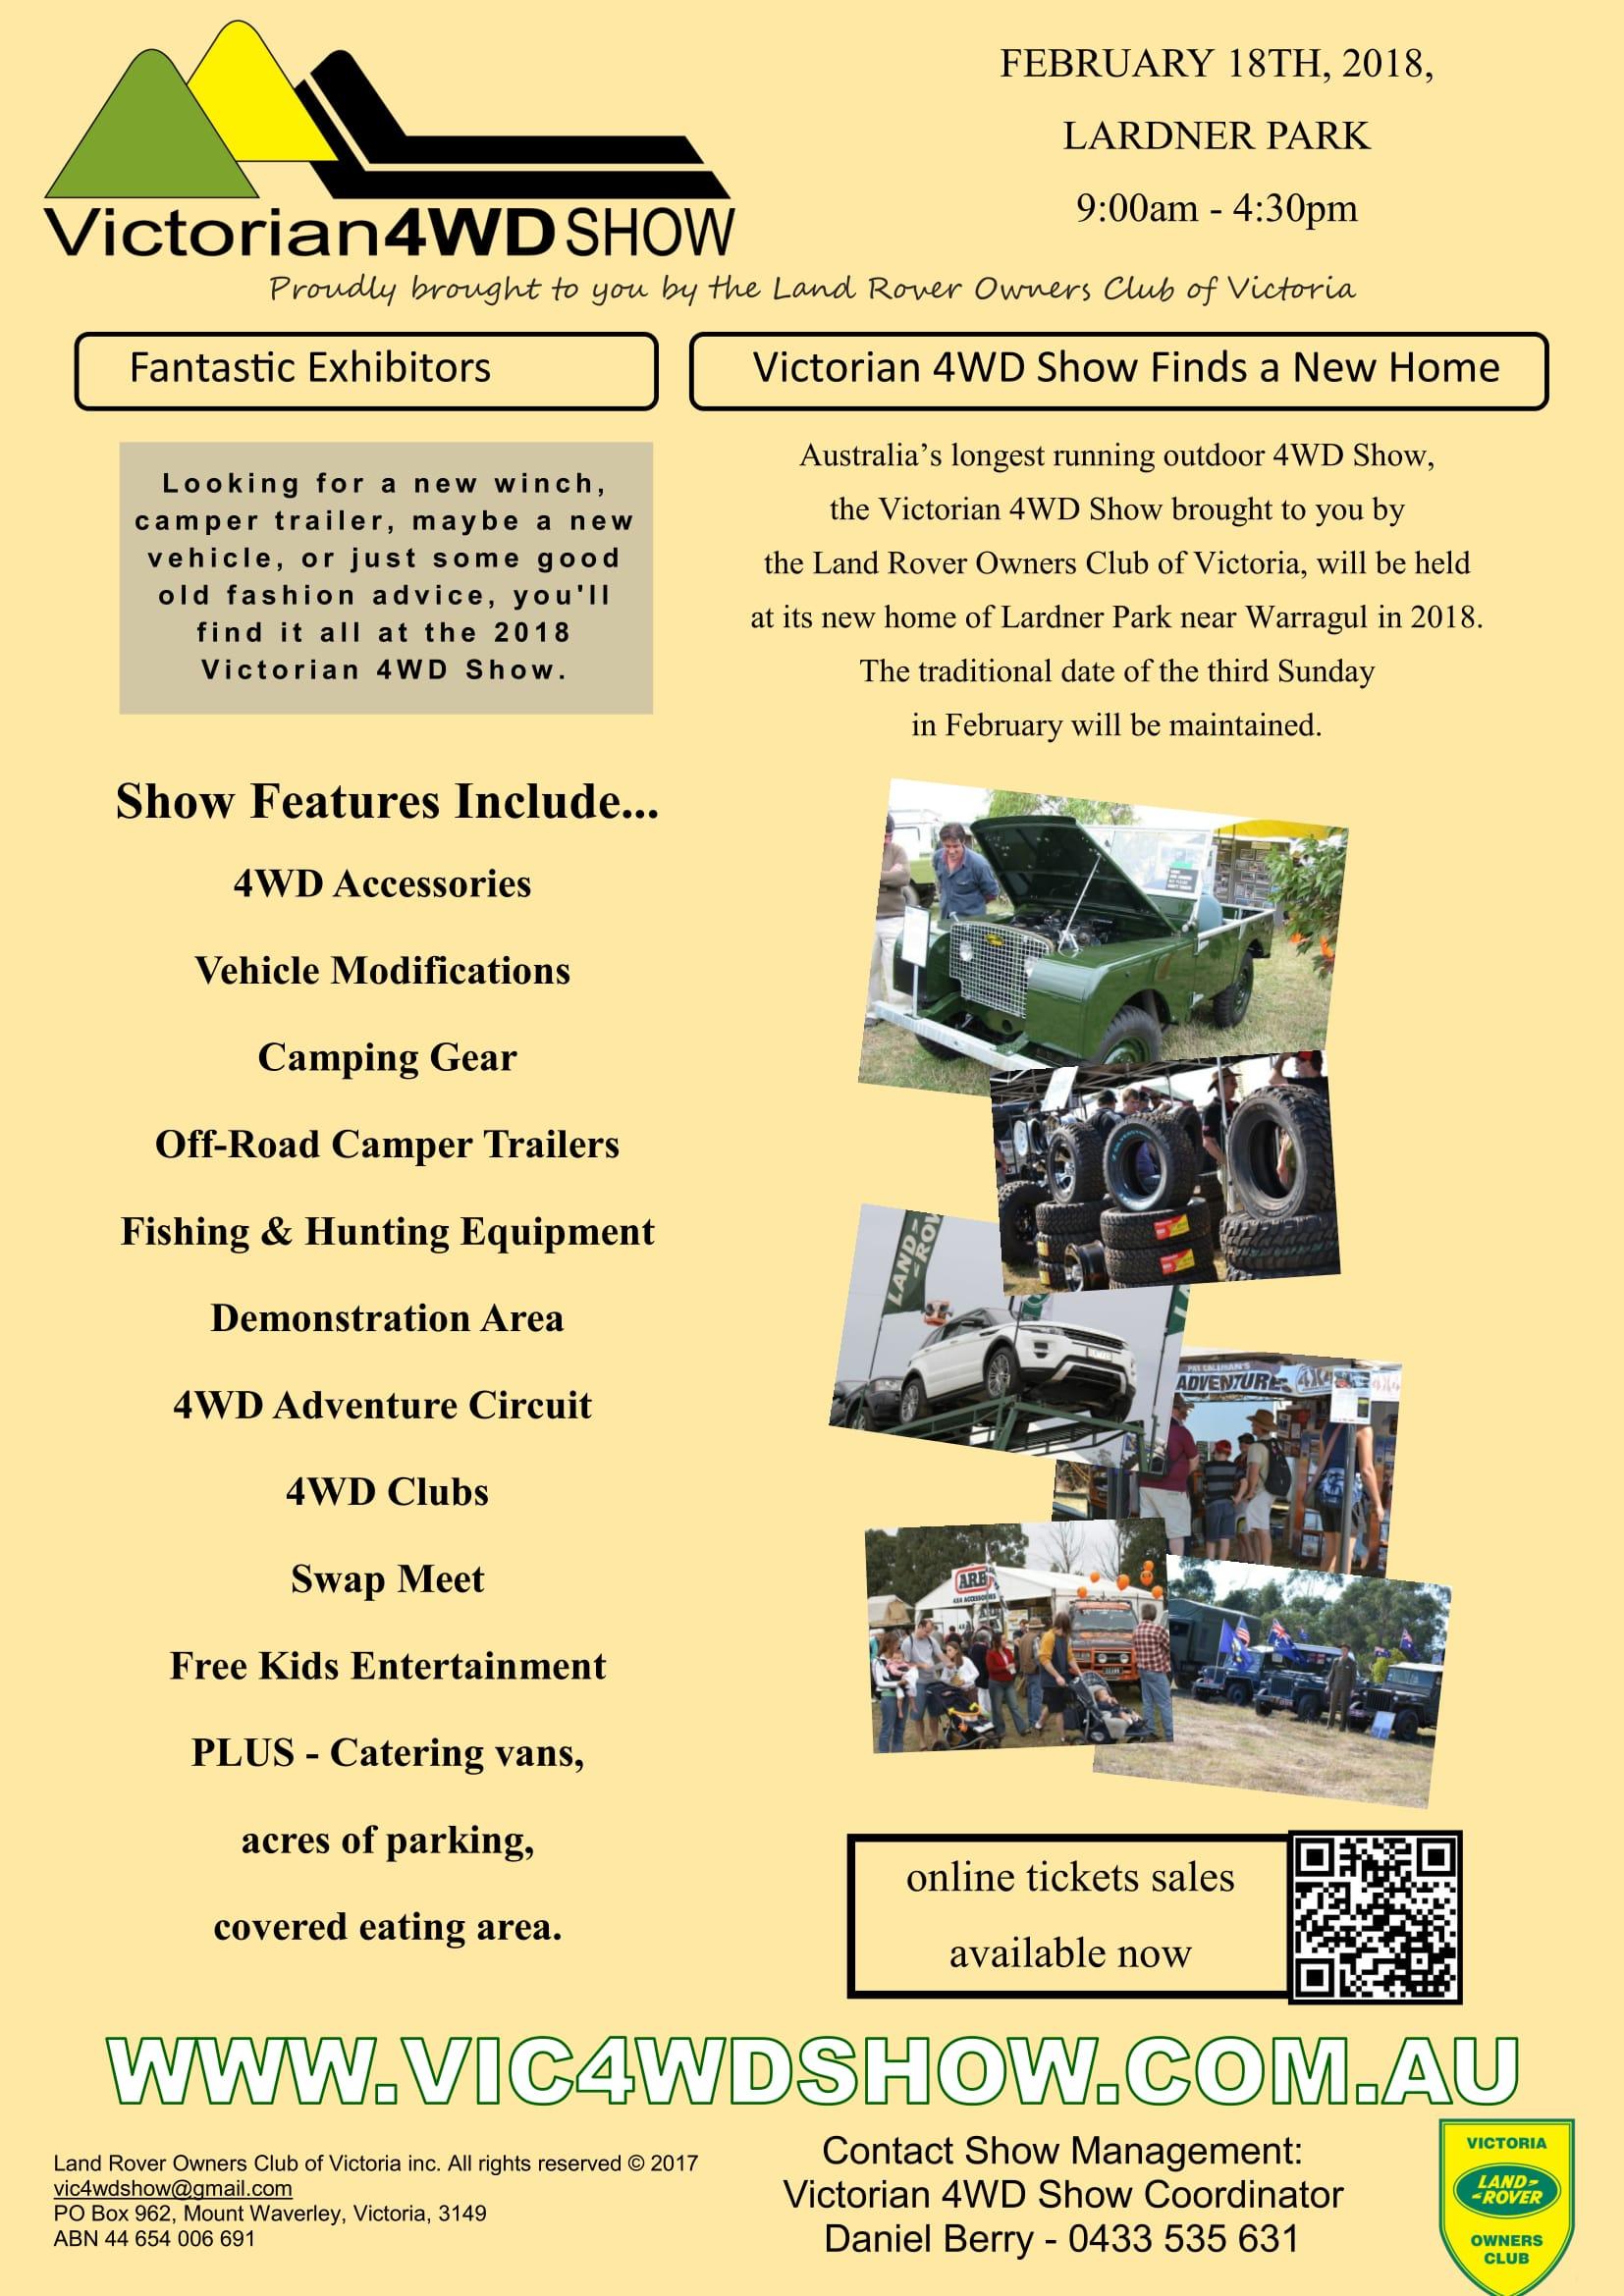 Victorian 4WD show and swapmeet 2018 @ LARDNER PARK | Lardner | Victoria | Australia